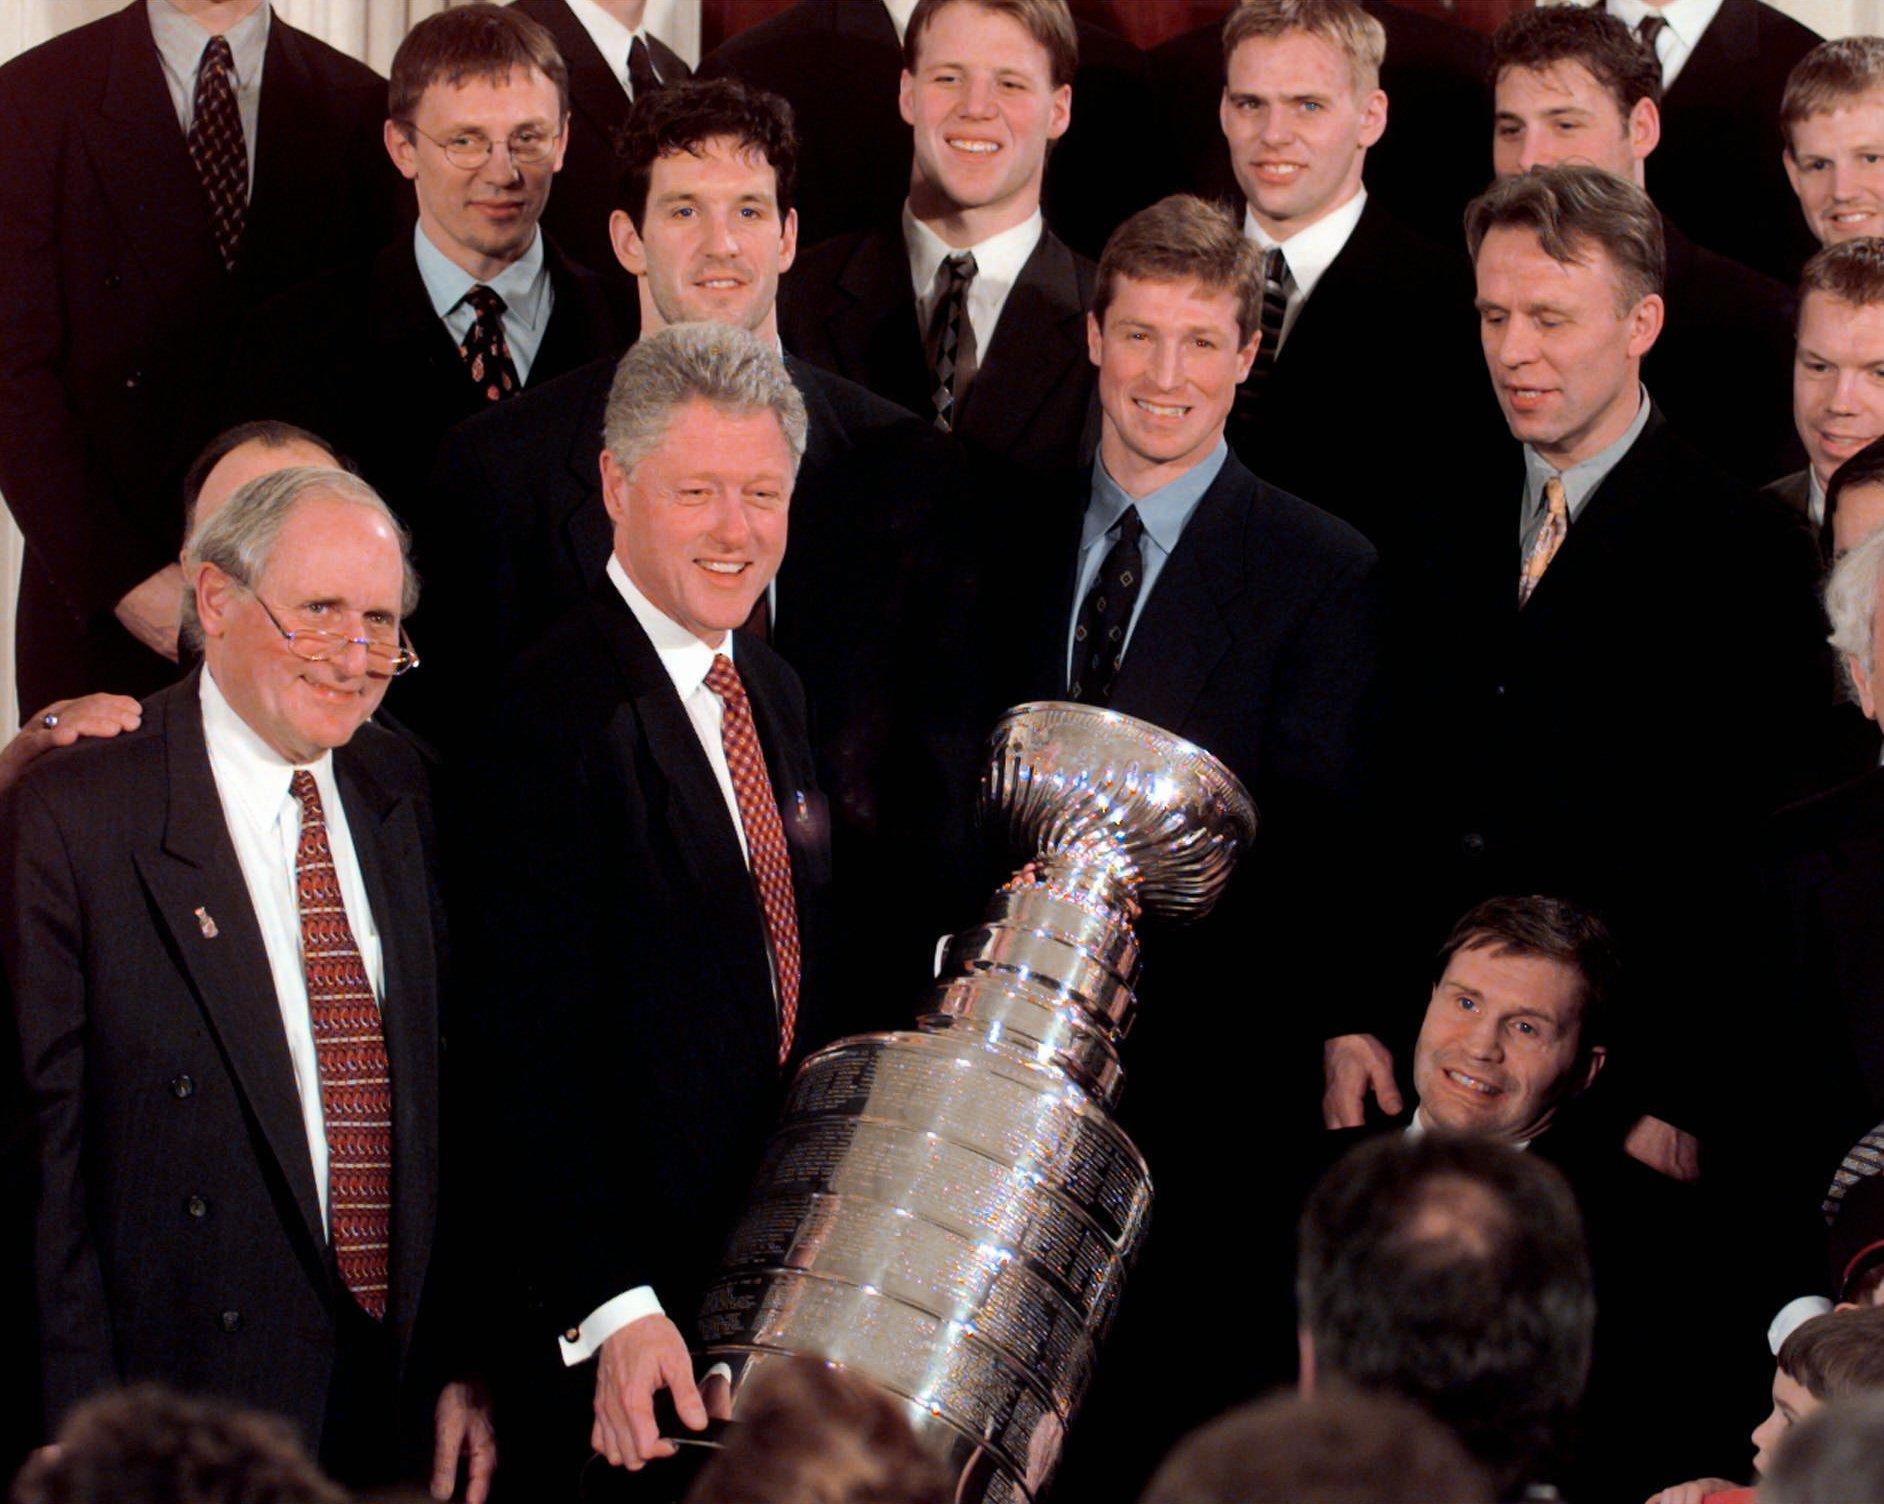 30 января 1998 года. «Детройт» на приеме у президента США Билла Клинтона